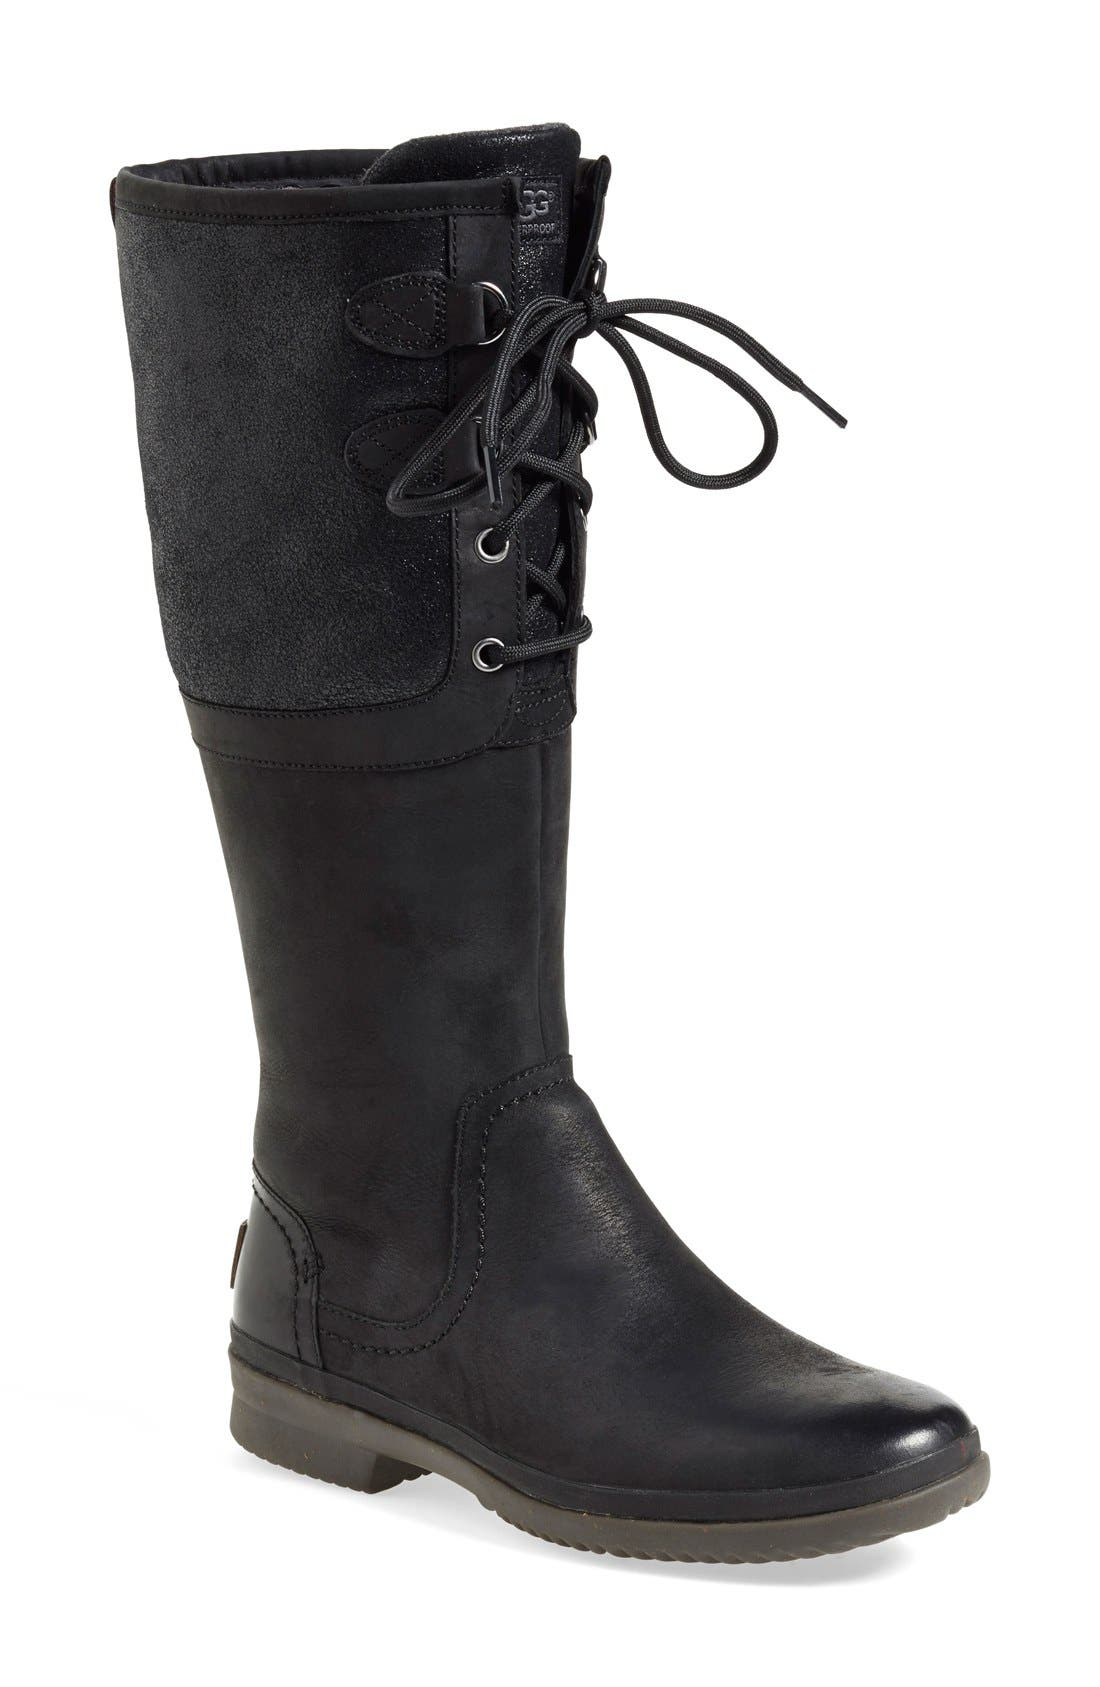 Alternate Image 1 Selected - UGG® 'Elsa' Waterproof Boot (Women)